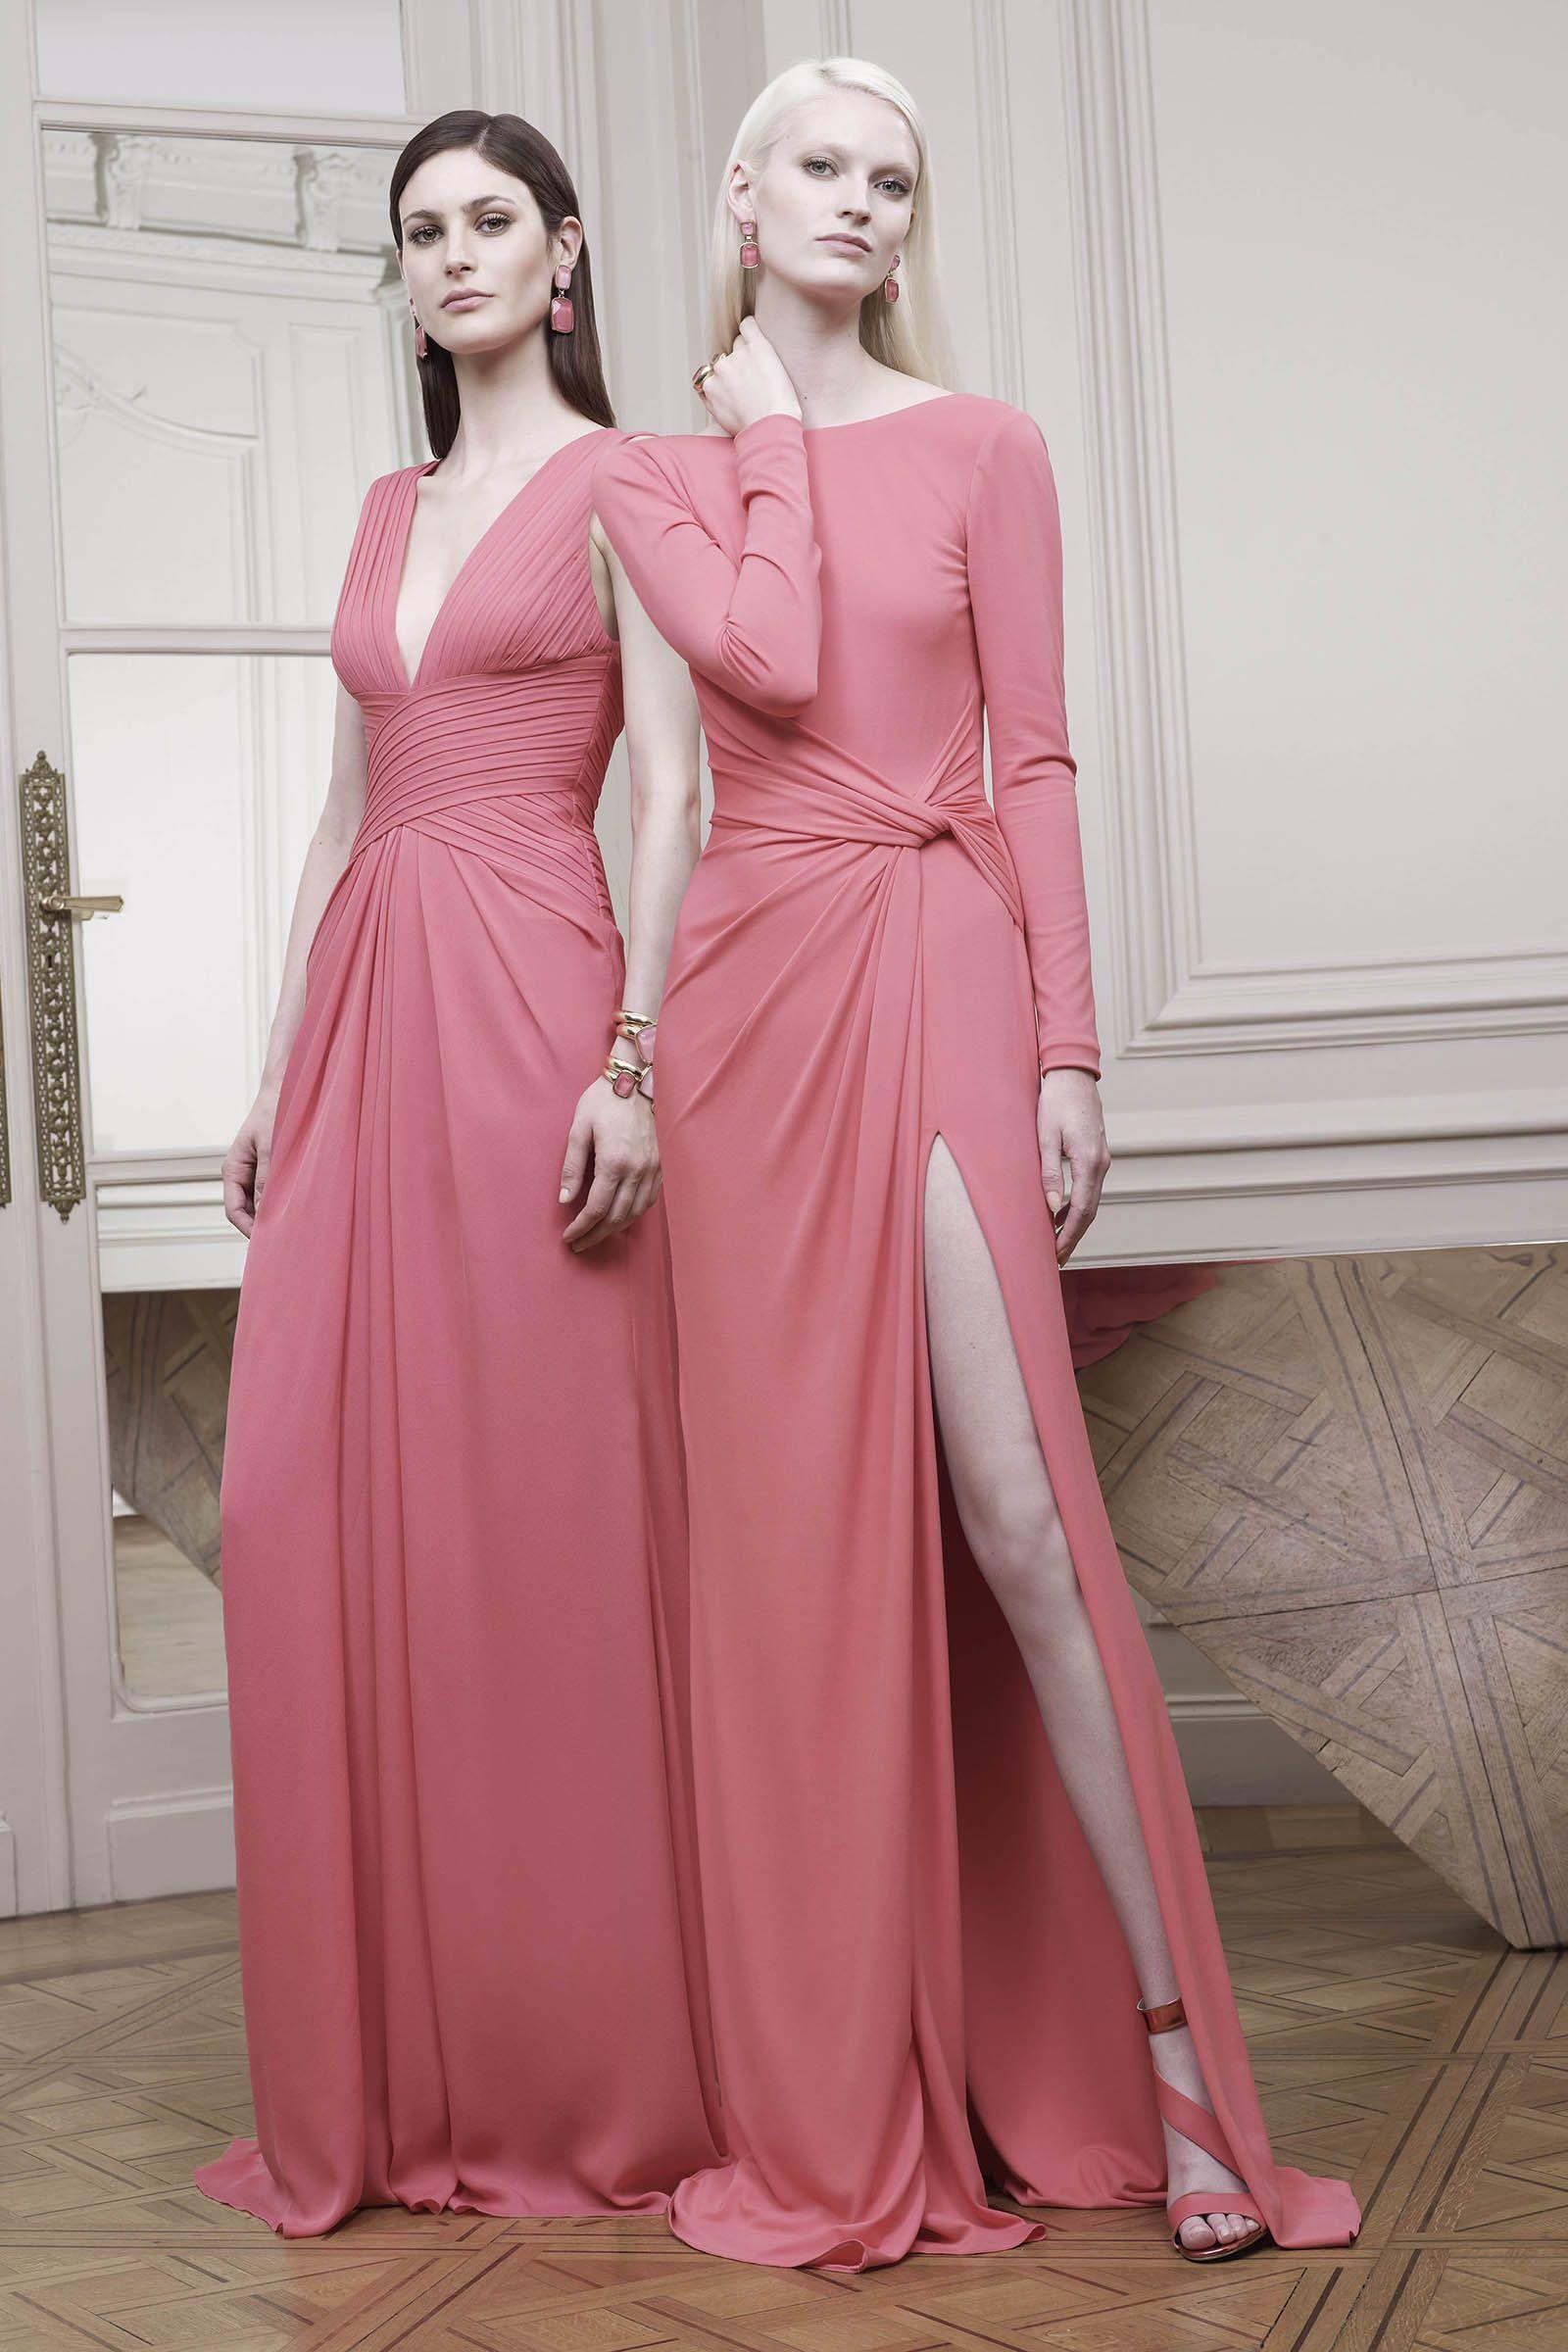 ELIE SAAB - Ready-to-Wear - Resort 2015 | My Kind Of Dresses ...